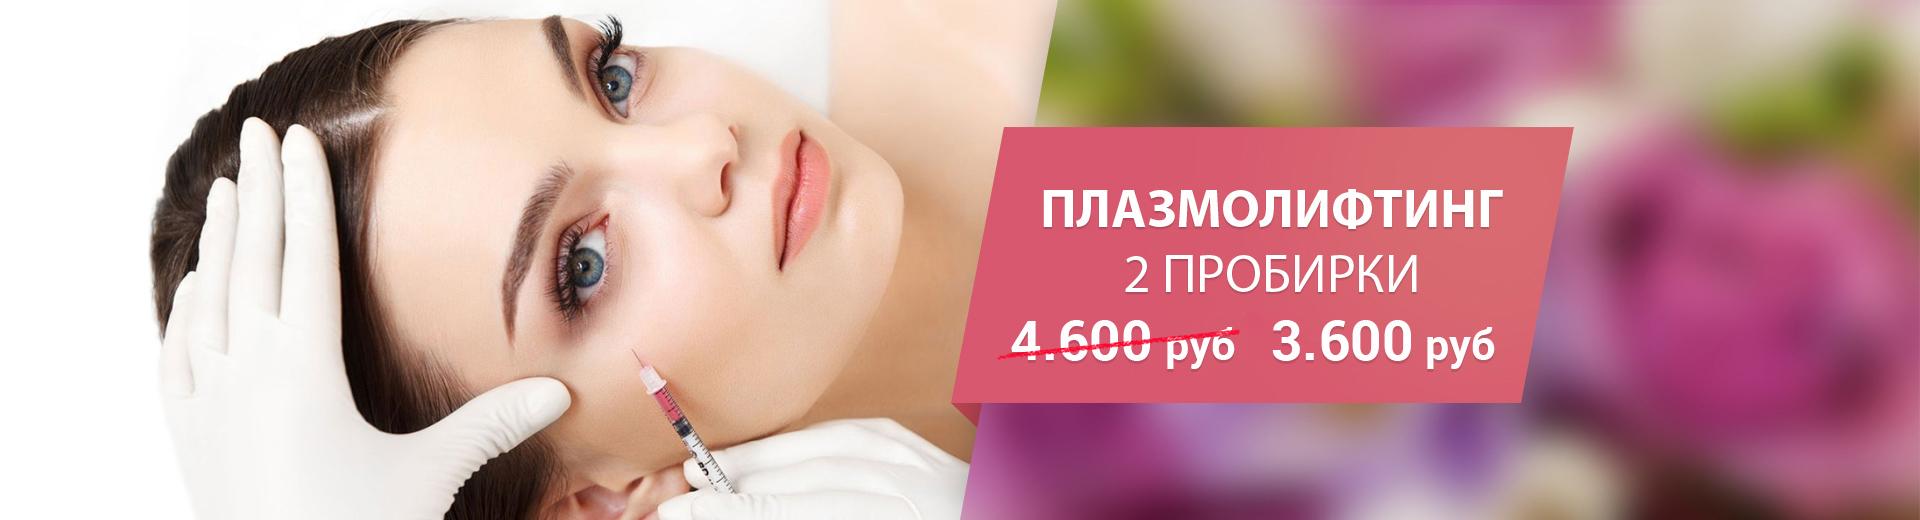 Плазмолифтинг 2 пробирки - 3.500 рублей